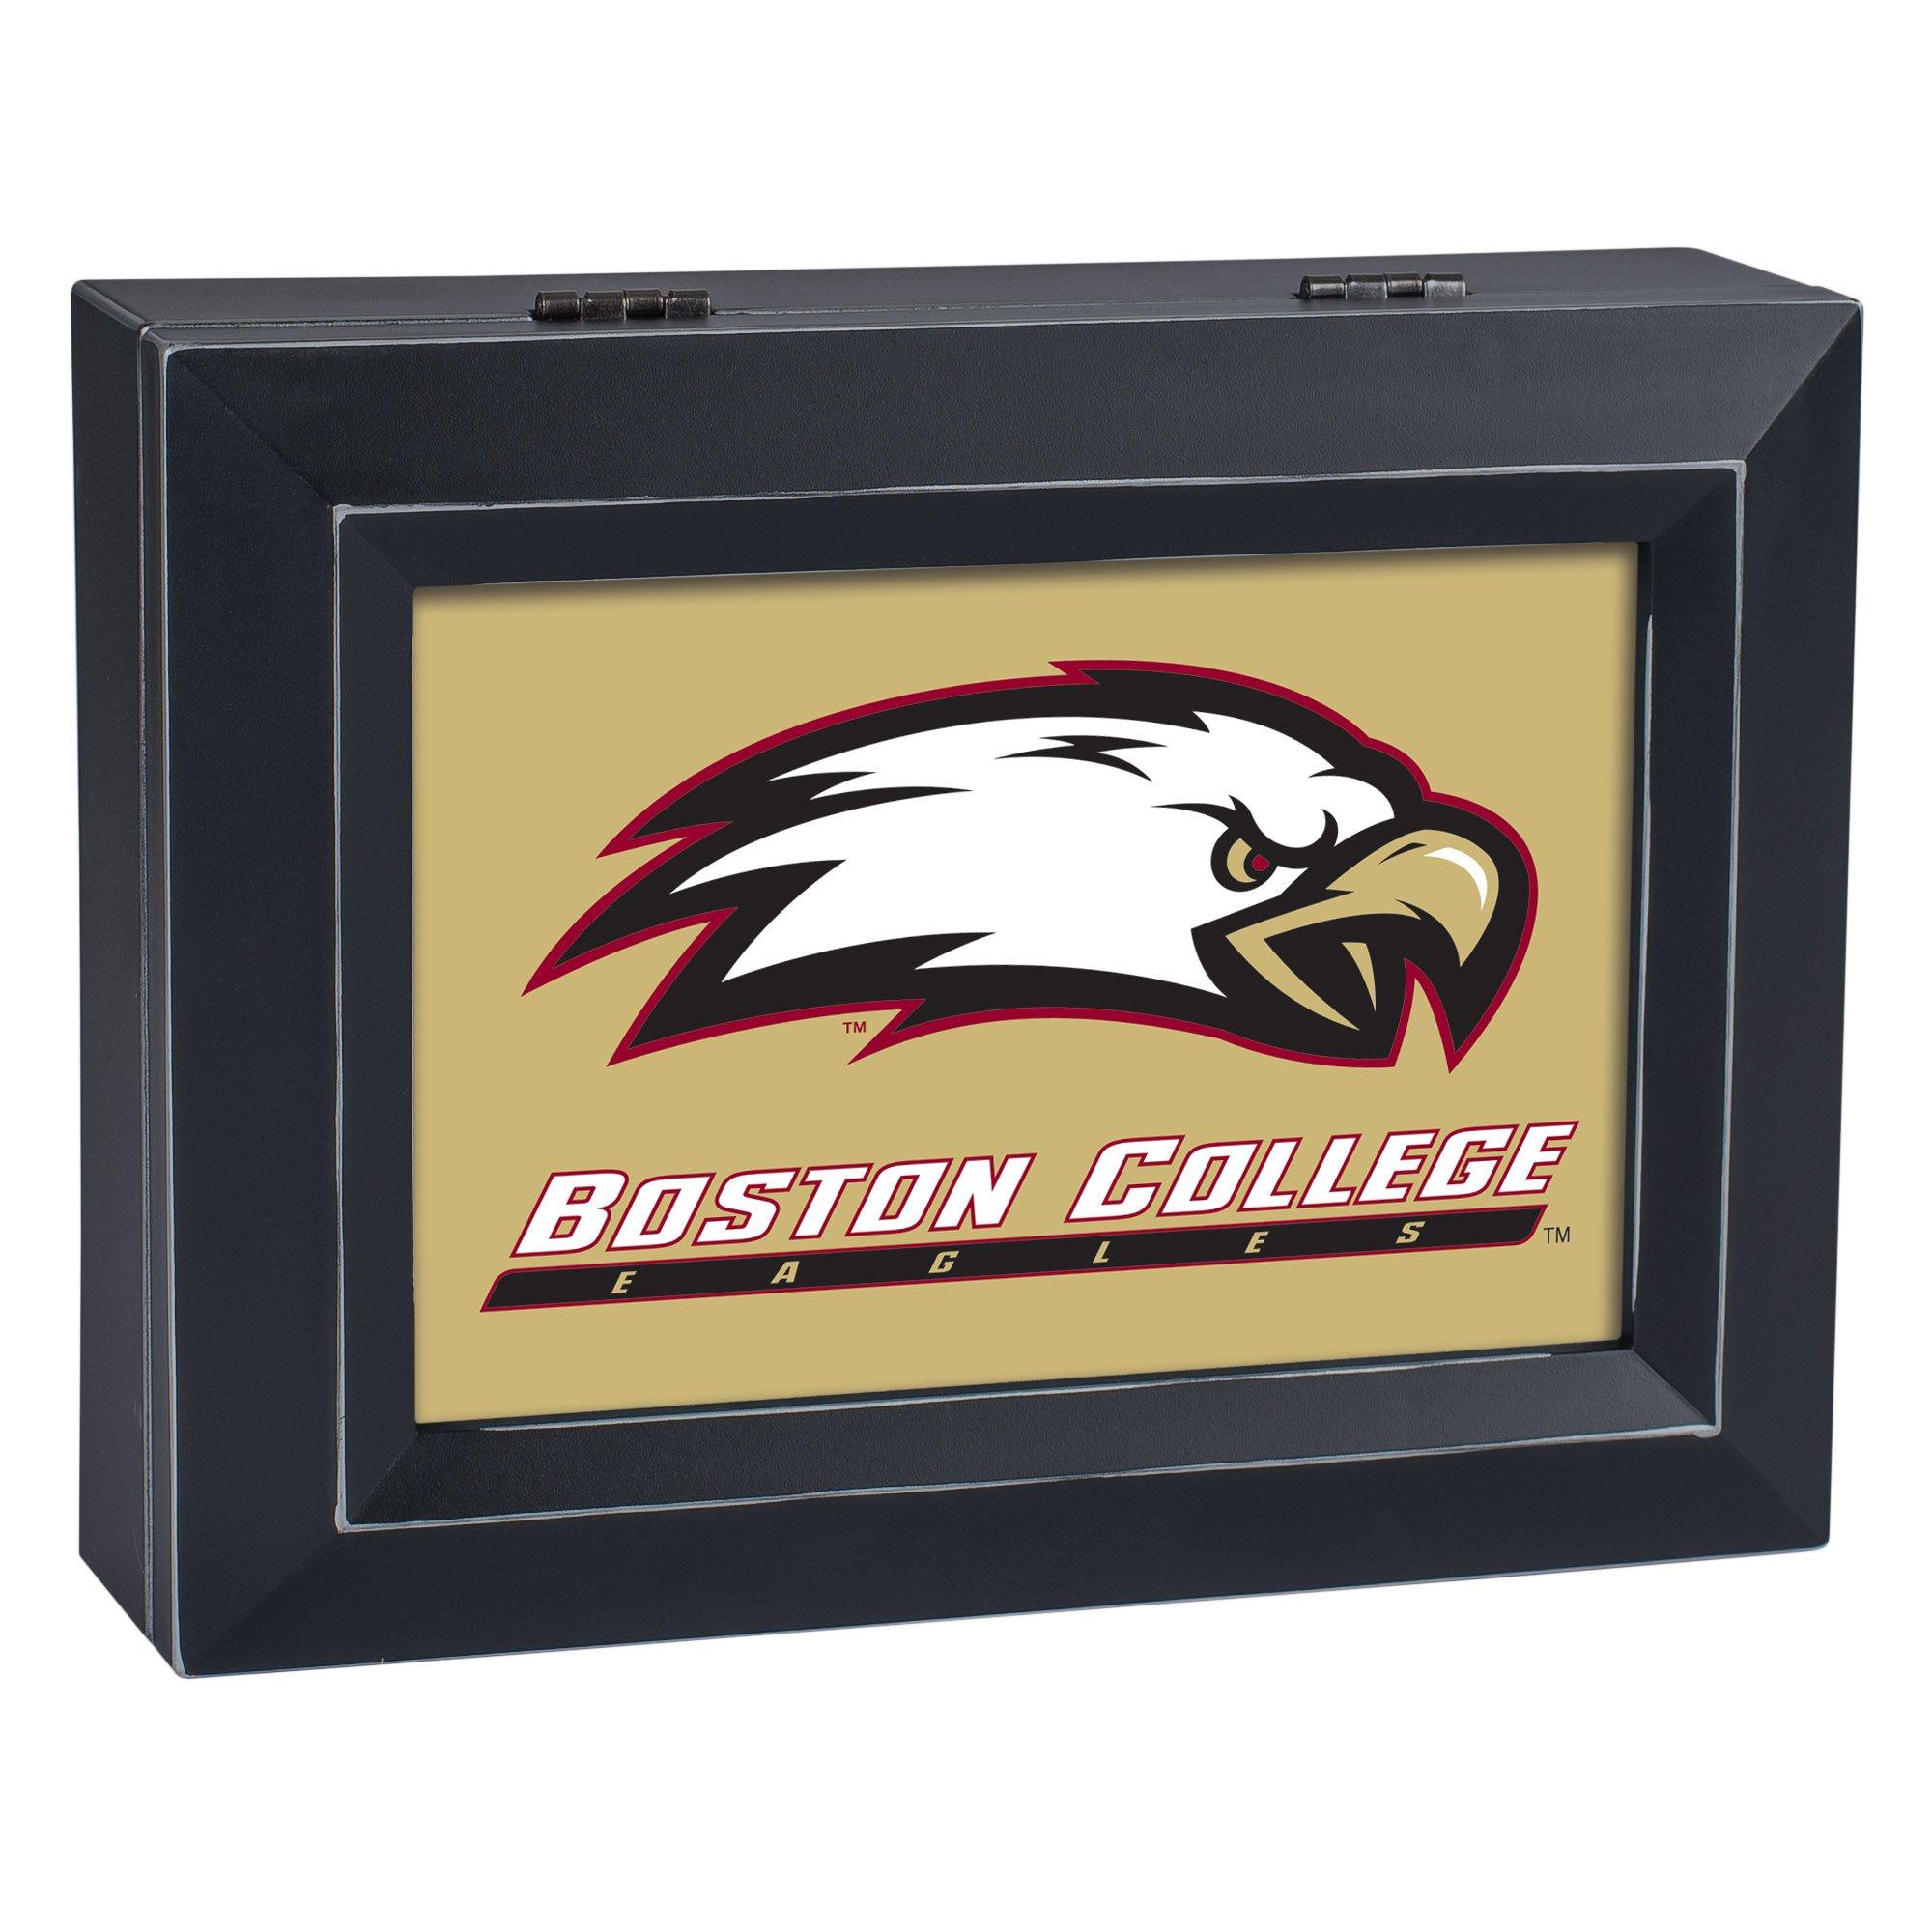 NCAA Collegiate Team Black Digital Fight Song Collegiate Box: Boston College by Cottage Garden (Image #2)